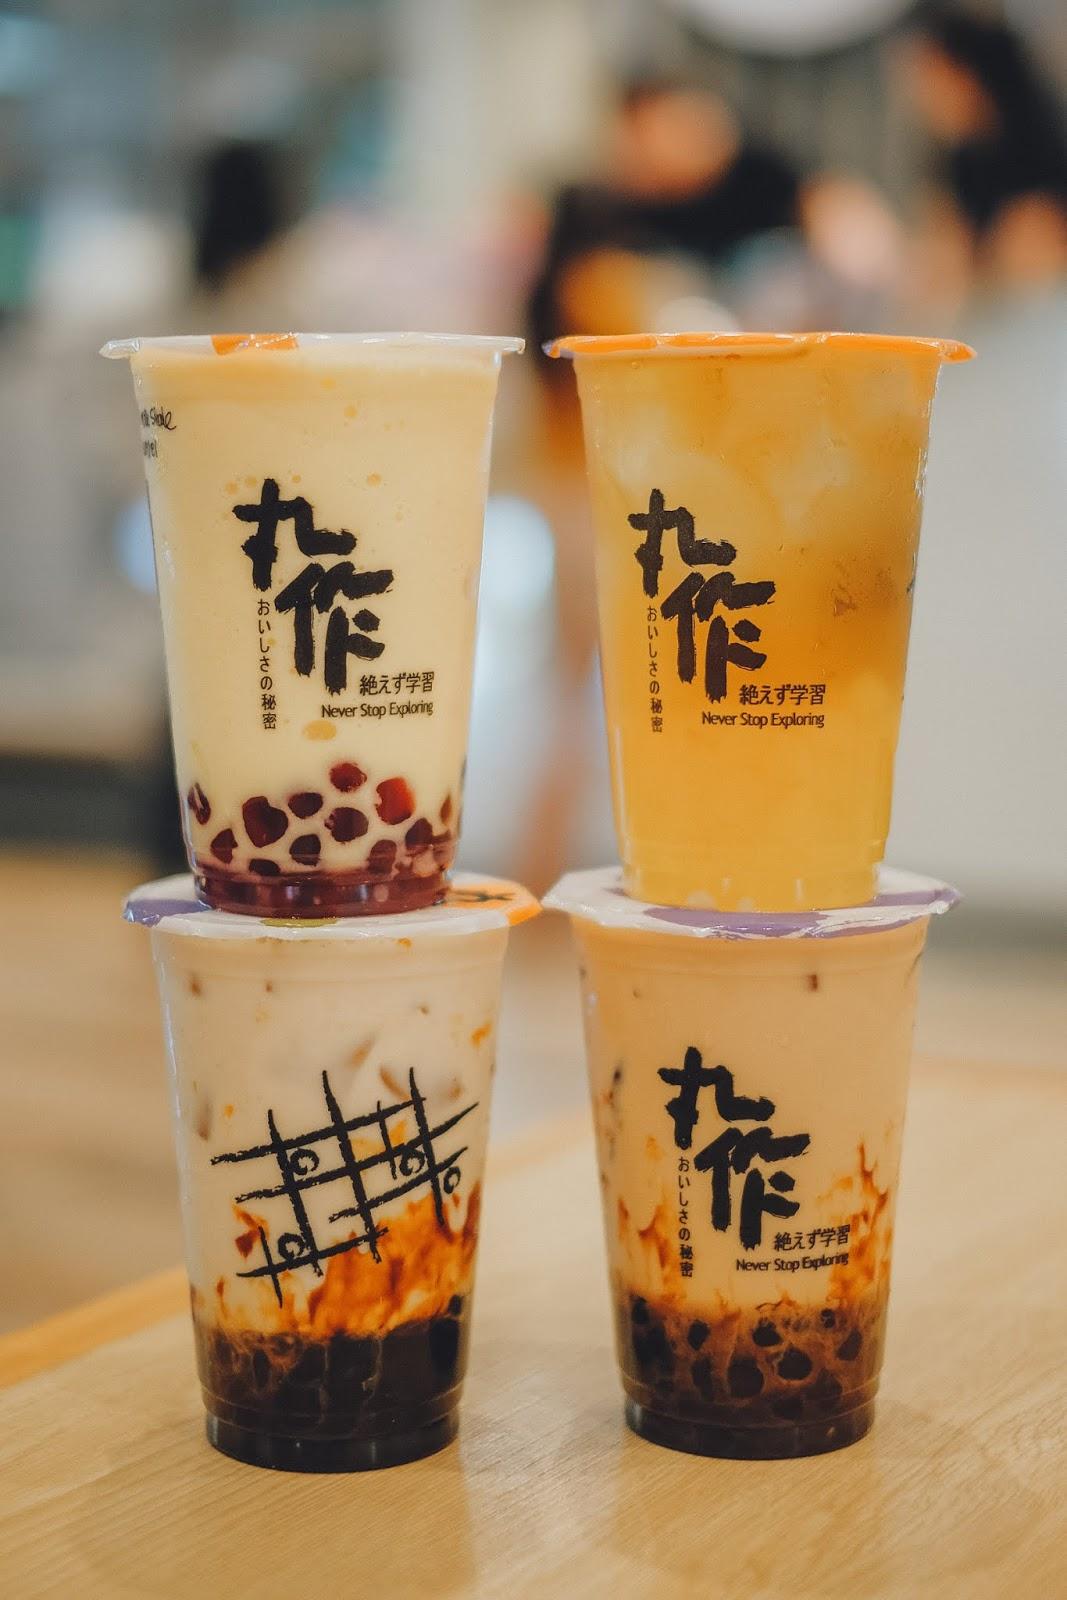 ONEZO: BEST BROWN SUGAR MILK DRINK IN JAKARTA? - eatandtreats